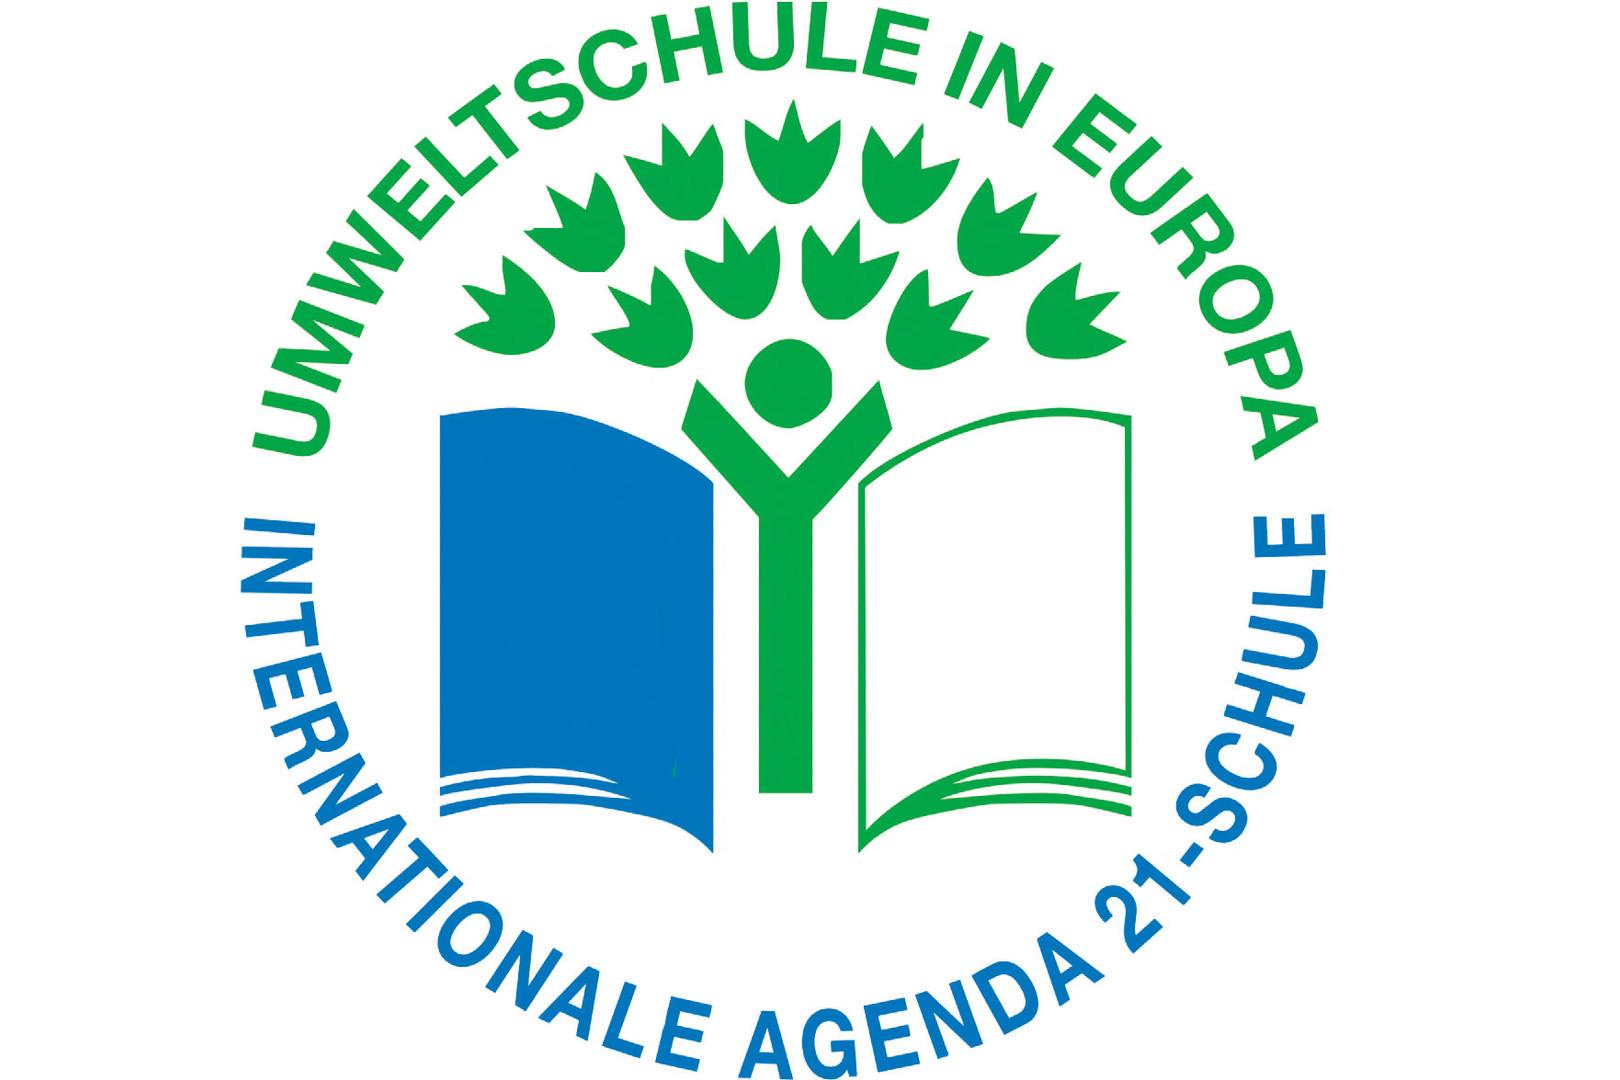 Agenda21schule_RGB_300.jpg